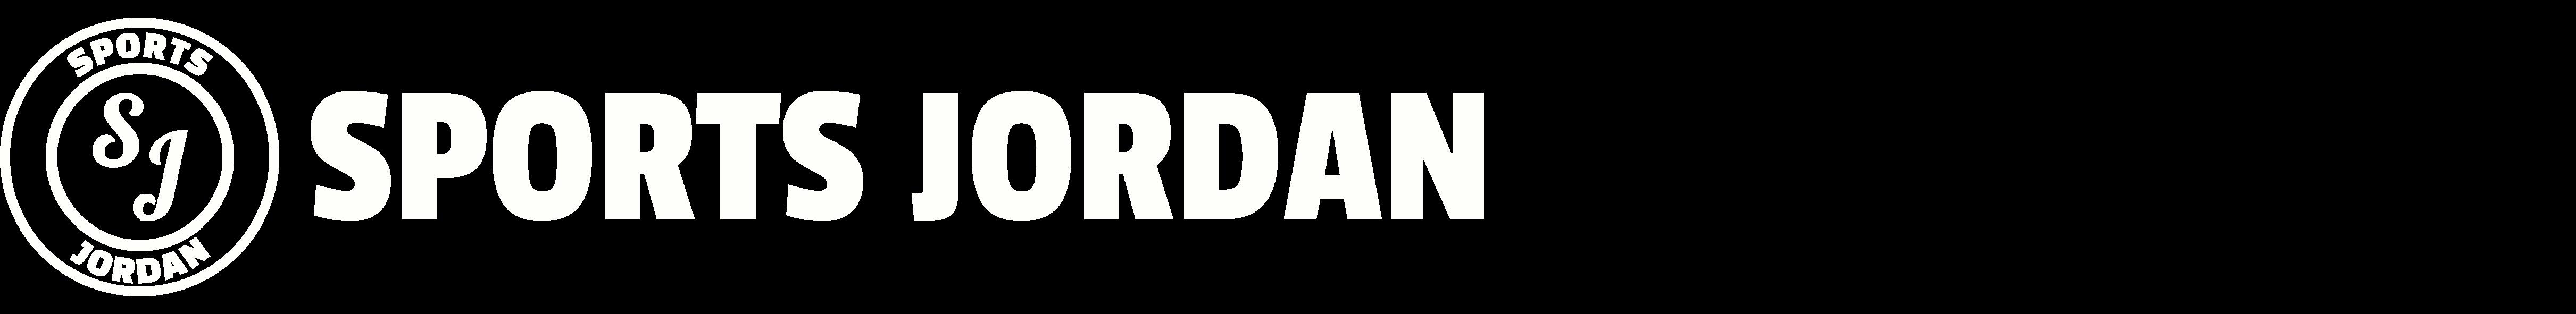 Sports Jordan